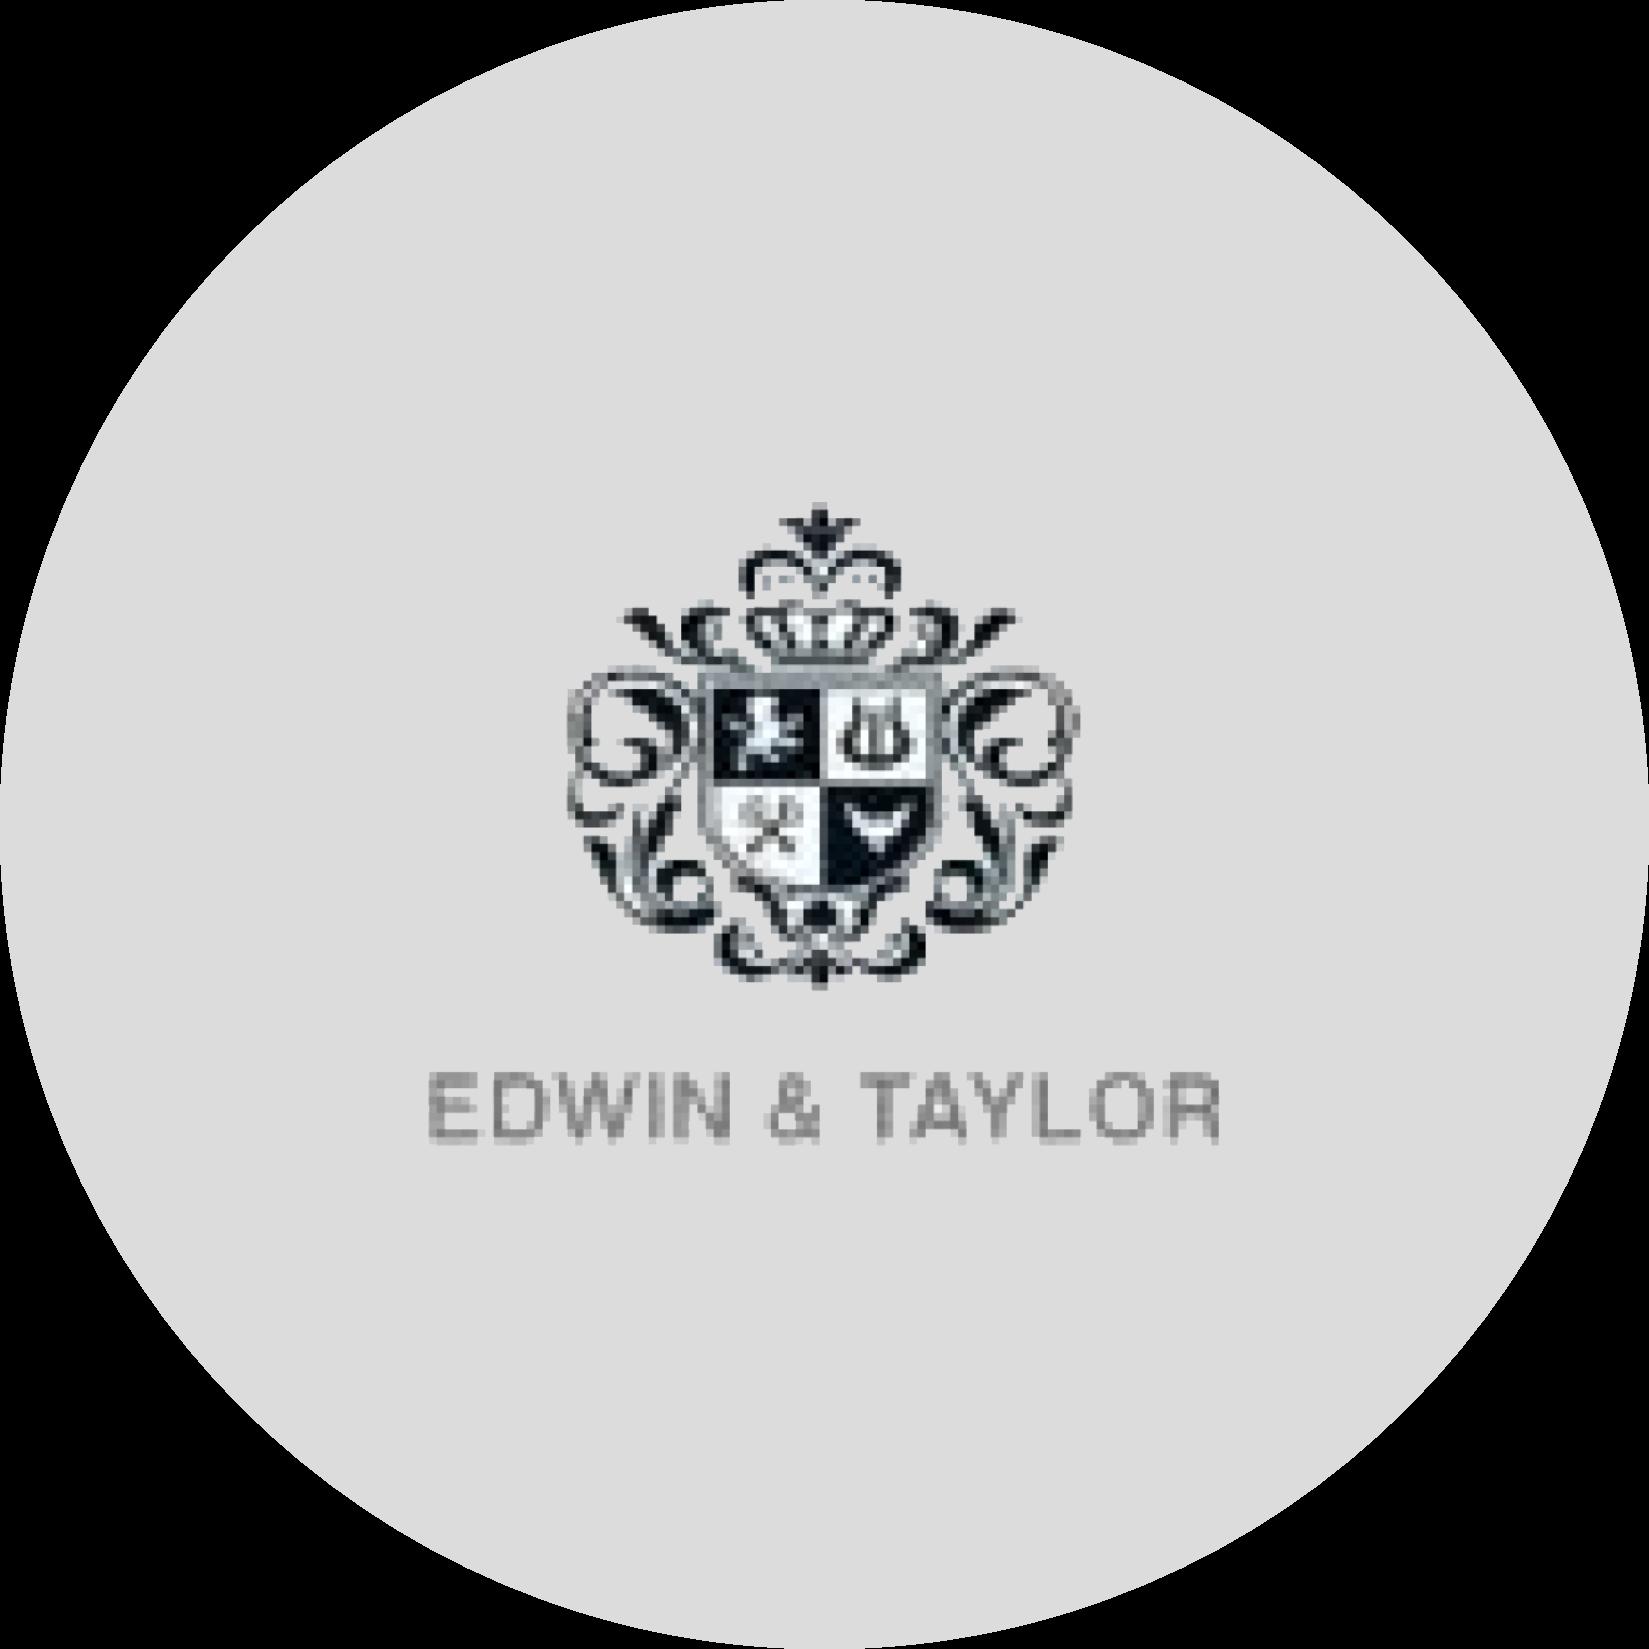 Edwin & Taylor